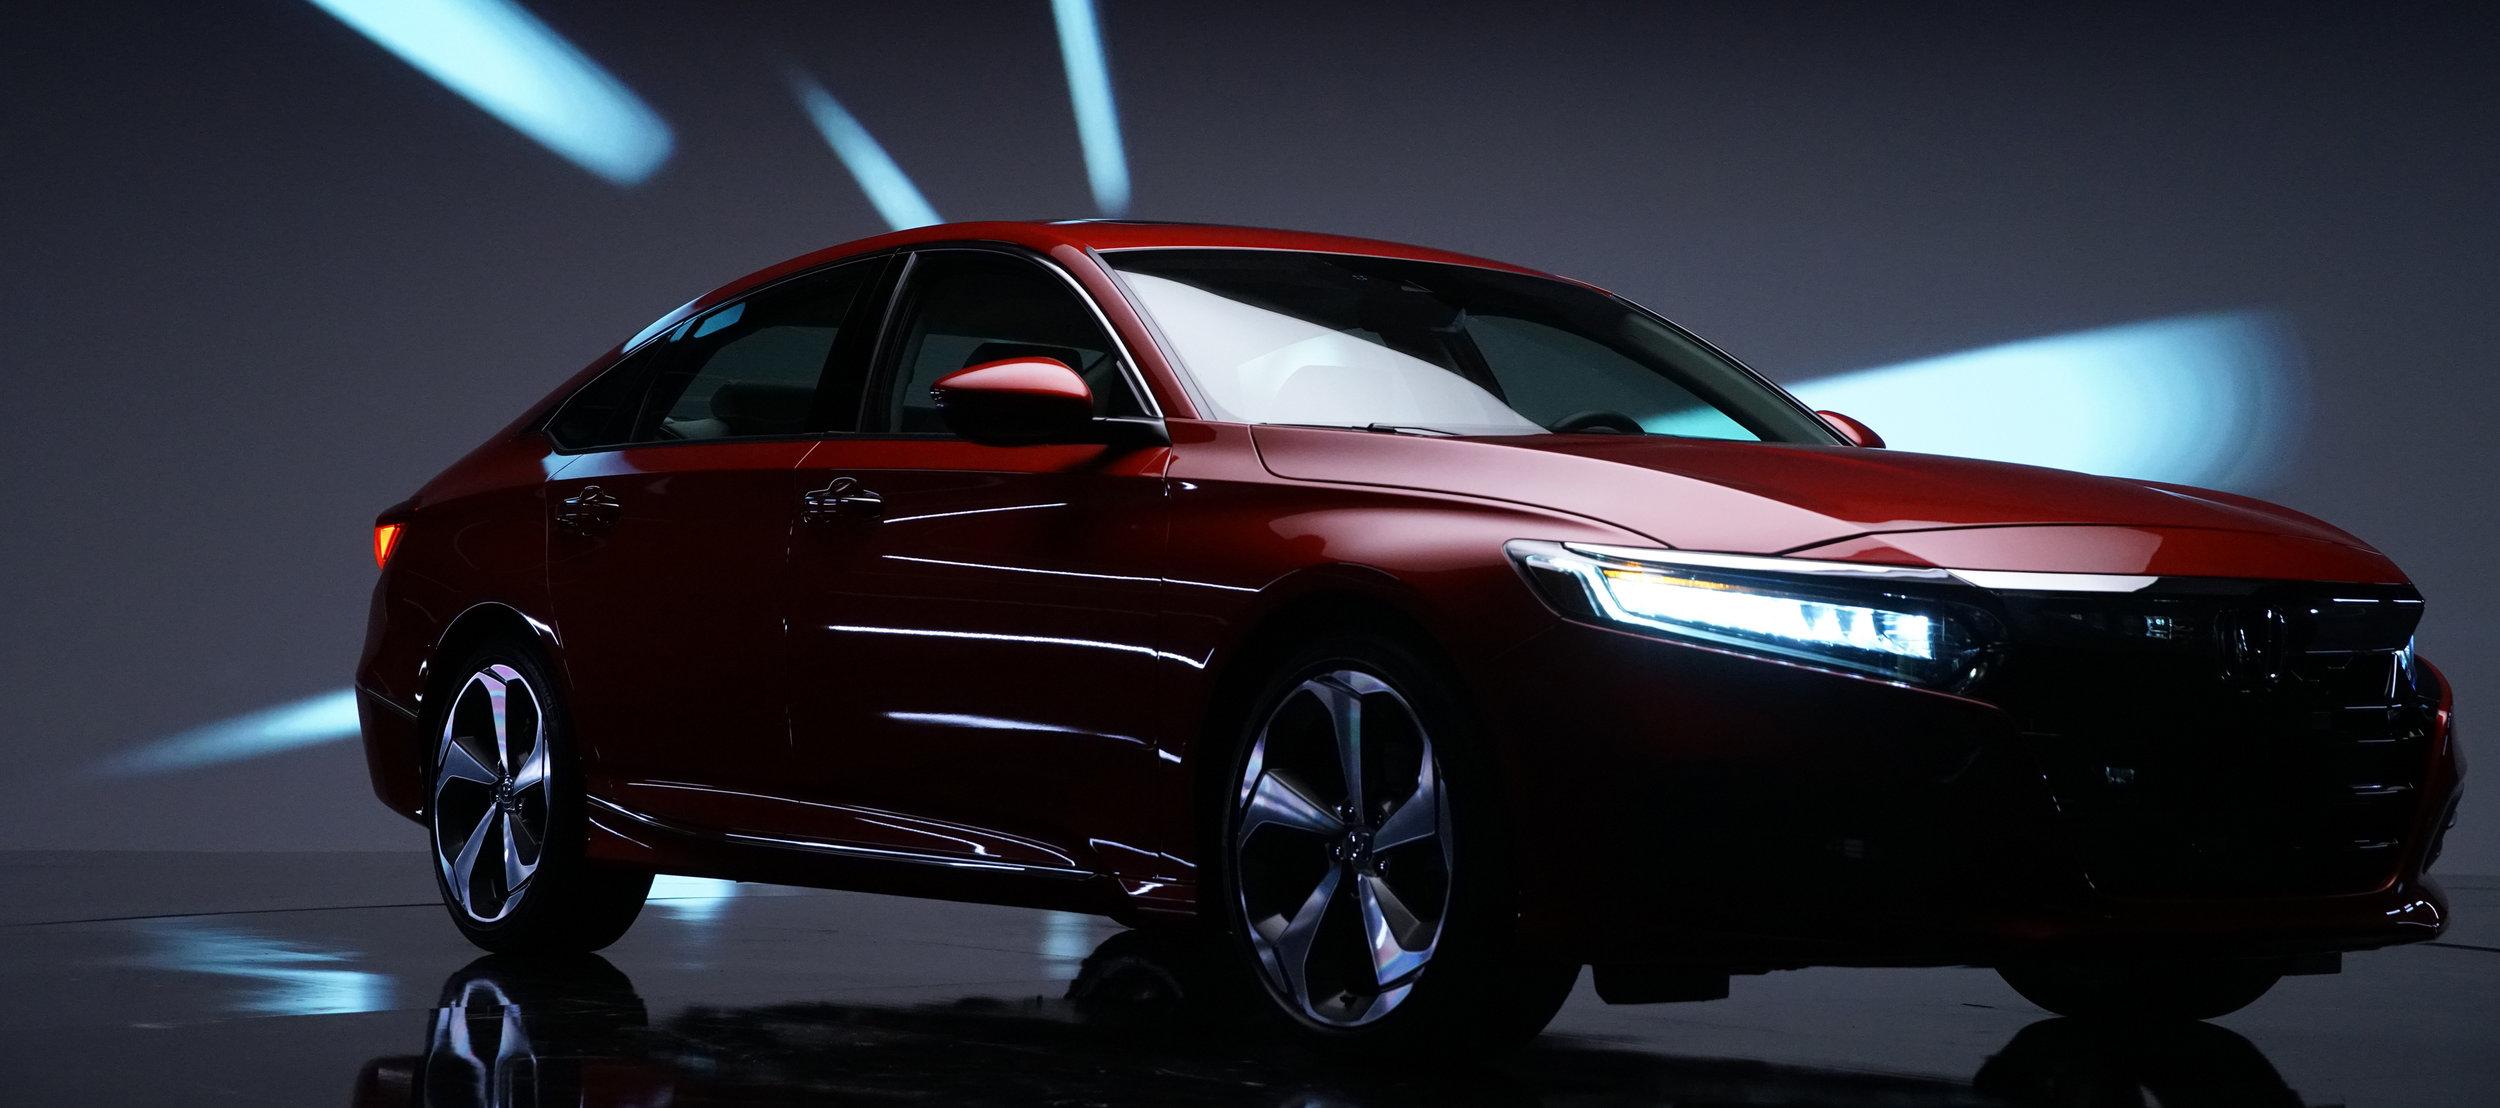 New car-23b.jpg